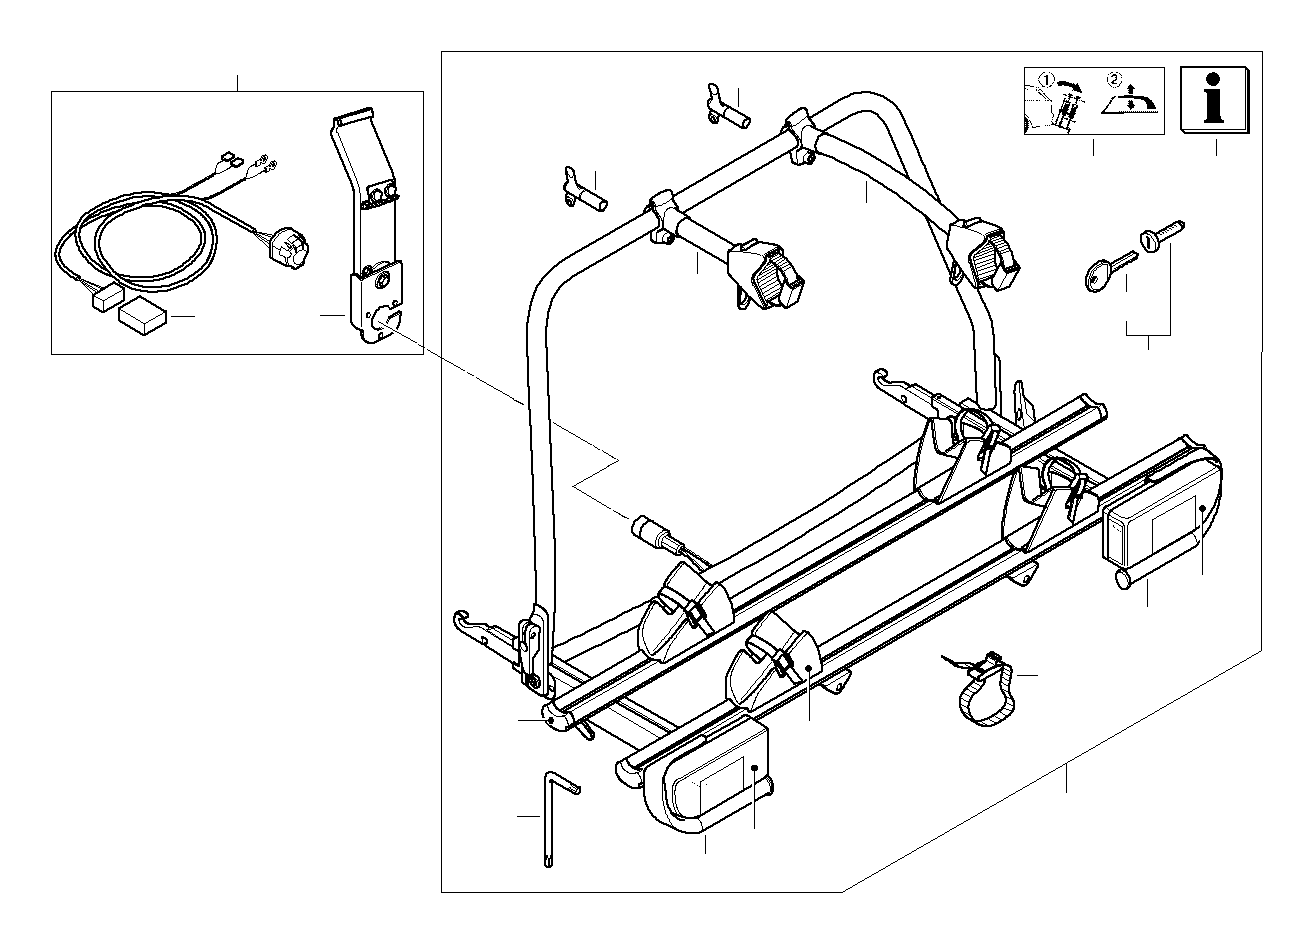 Bmw X1 Trailer Towing Module 4r Alpina Rear Ece